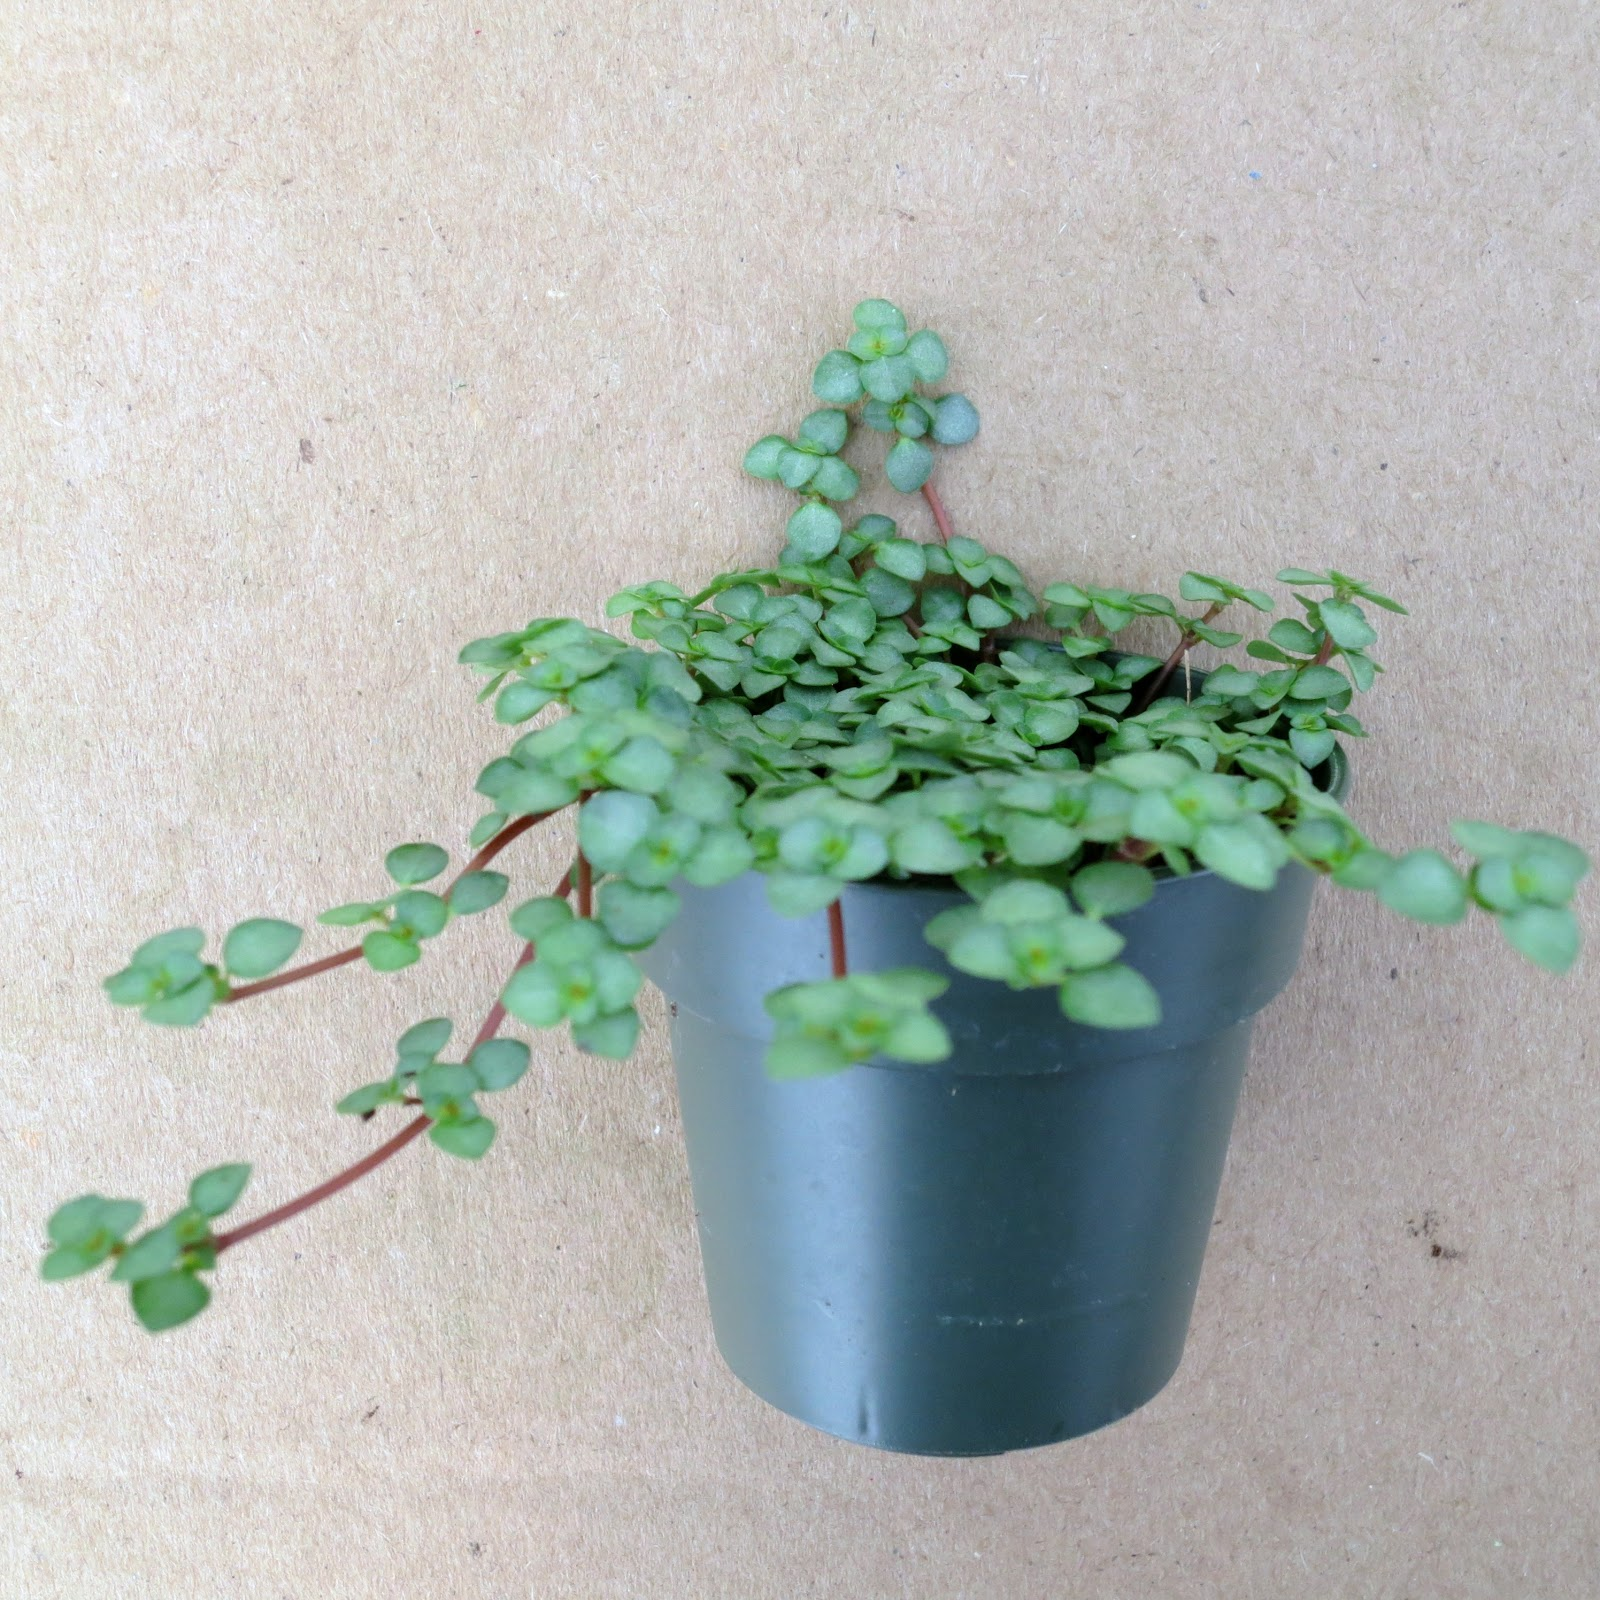 Blue Jobu0027s Tears   U0027Miniu0027 Plants For Miniature Gardens